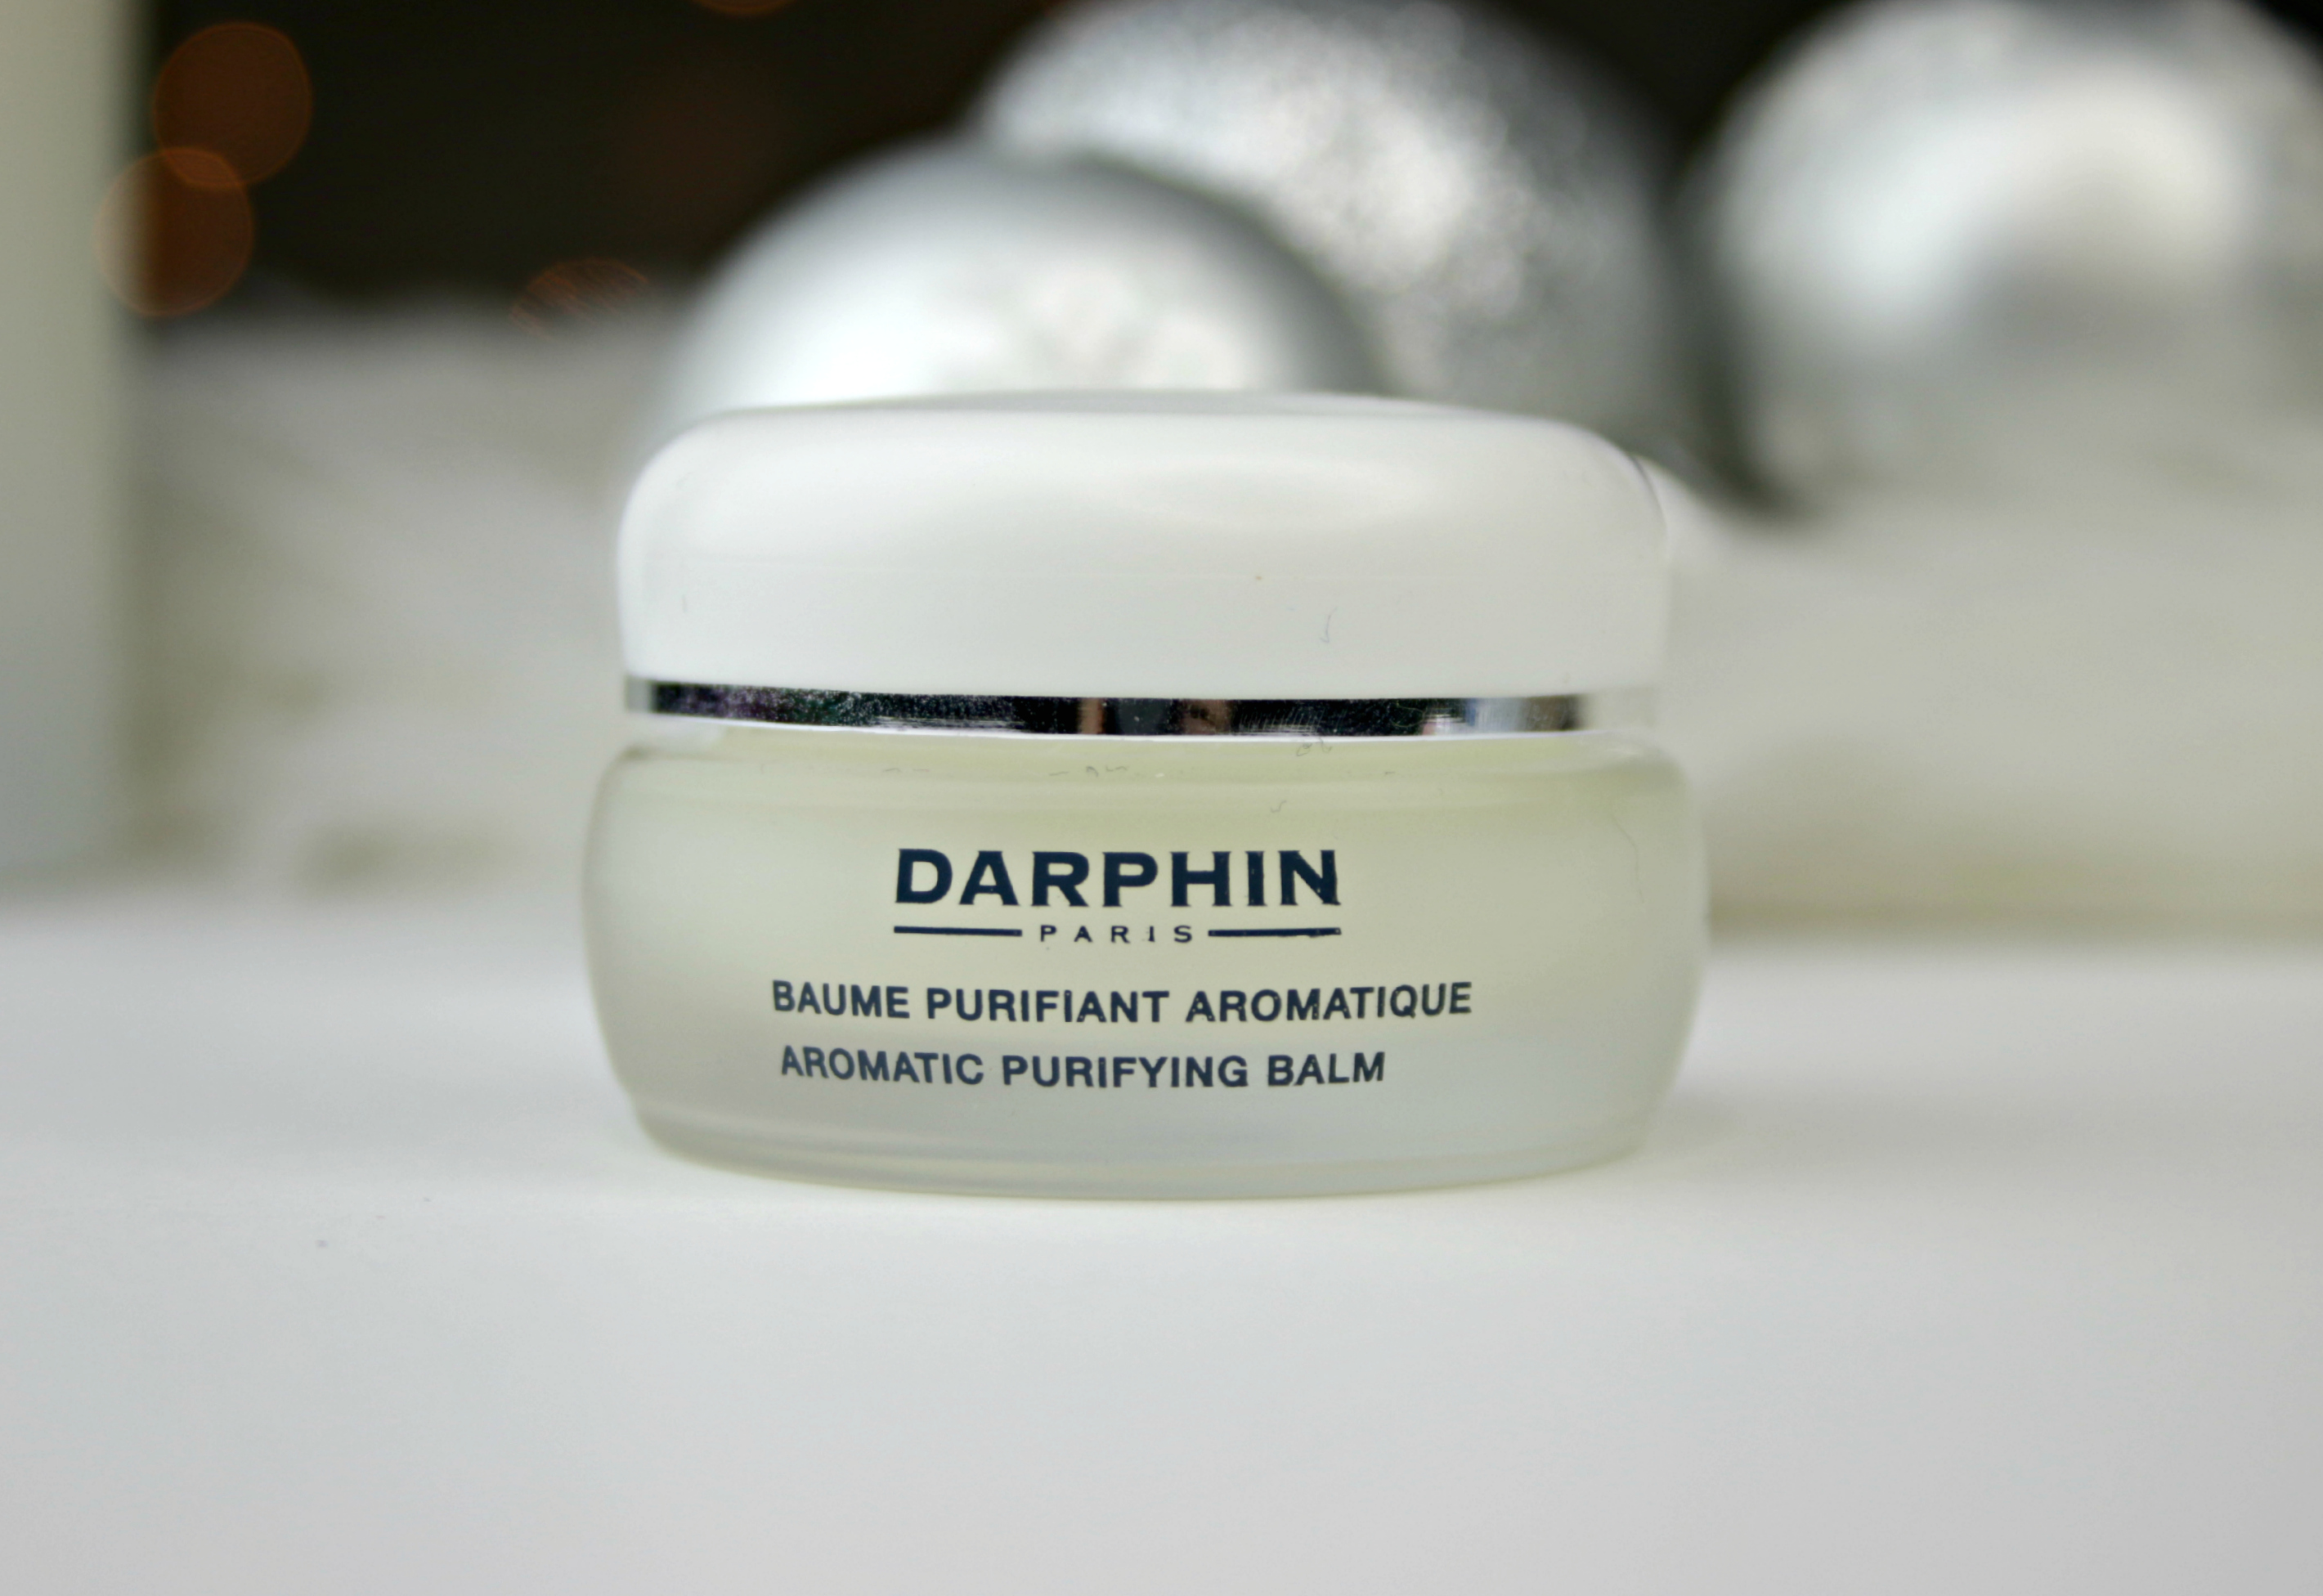 Darphin purifying balm